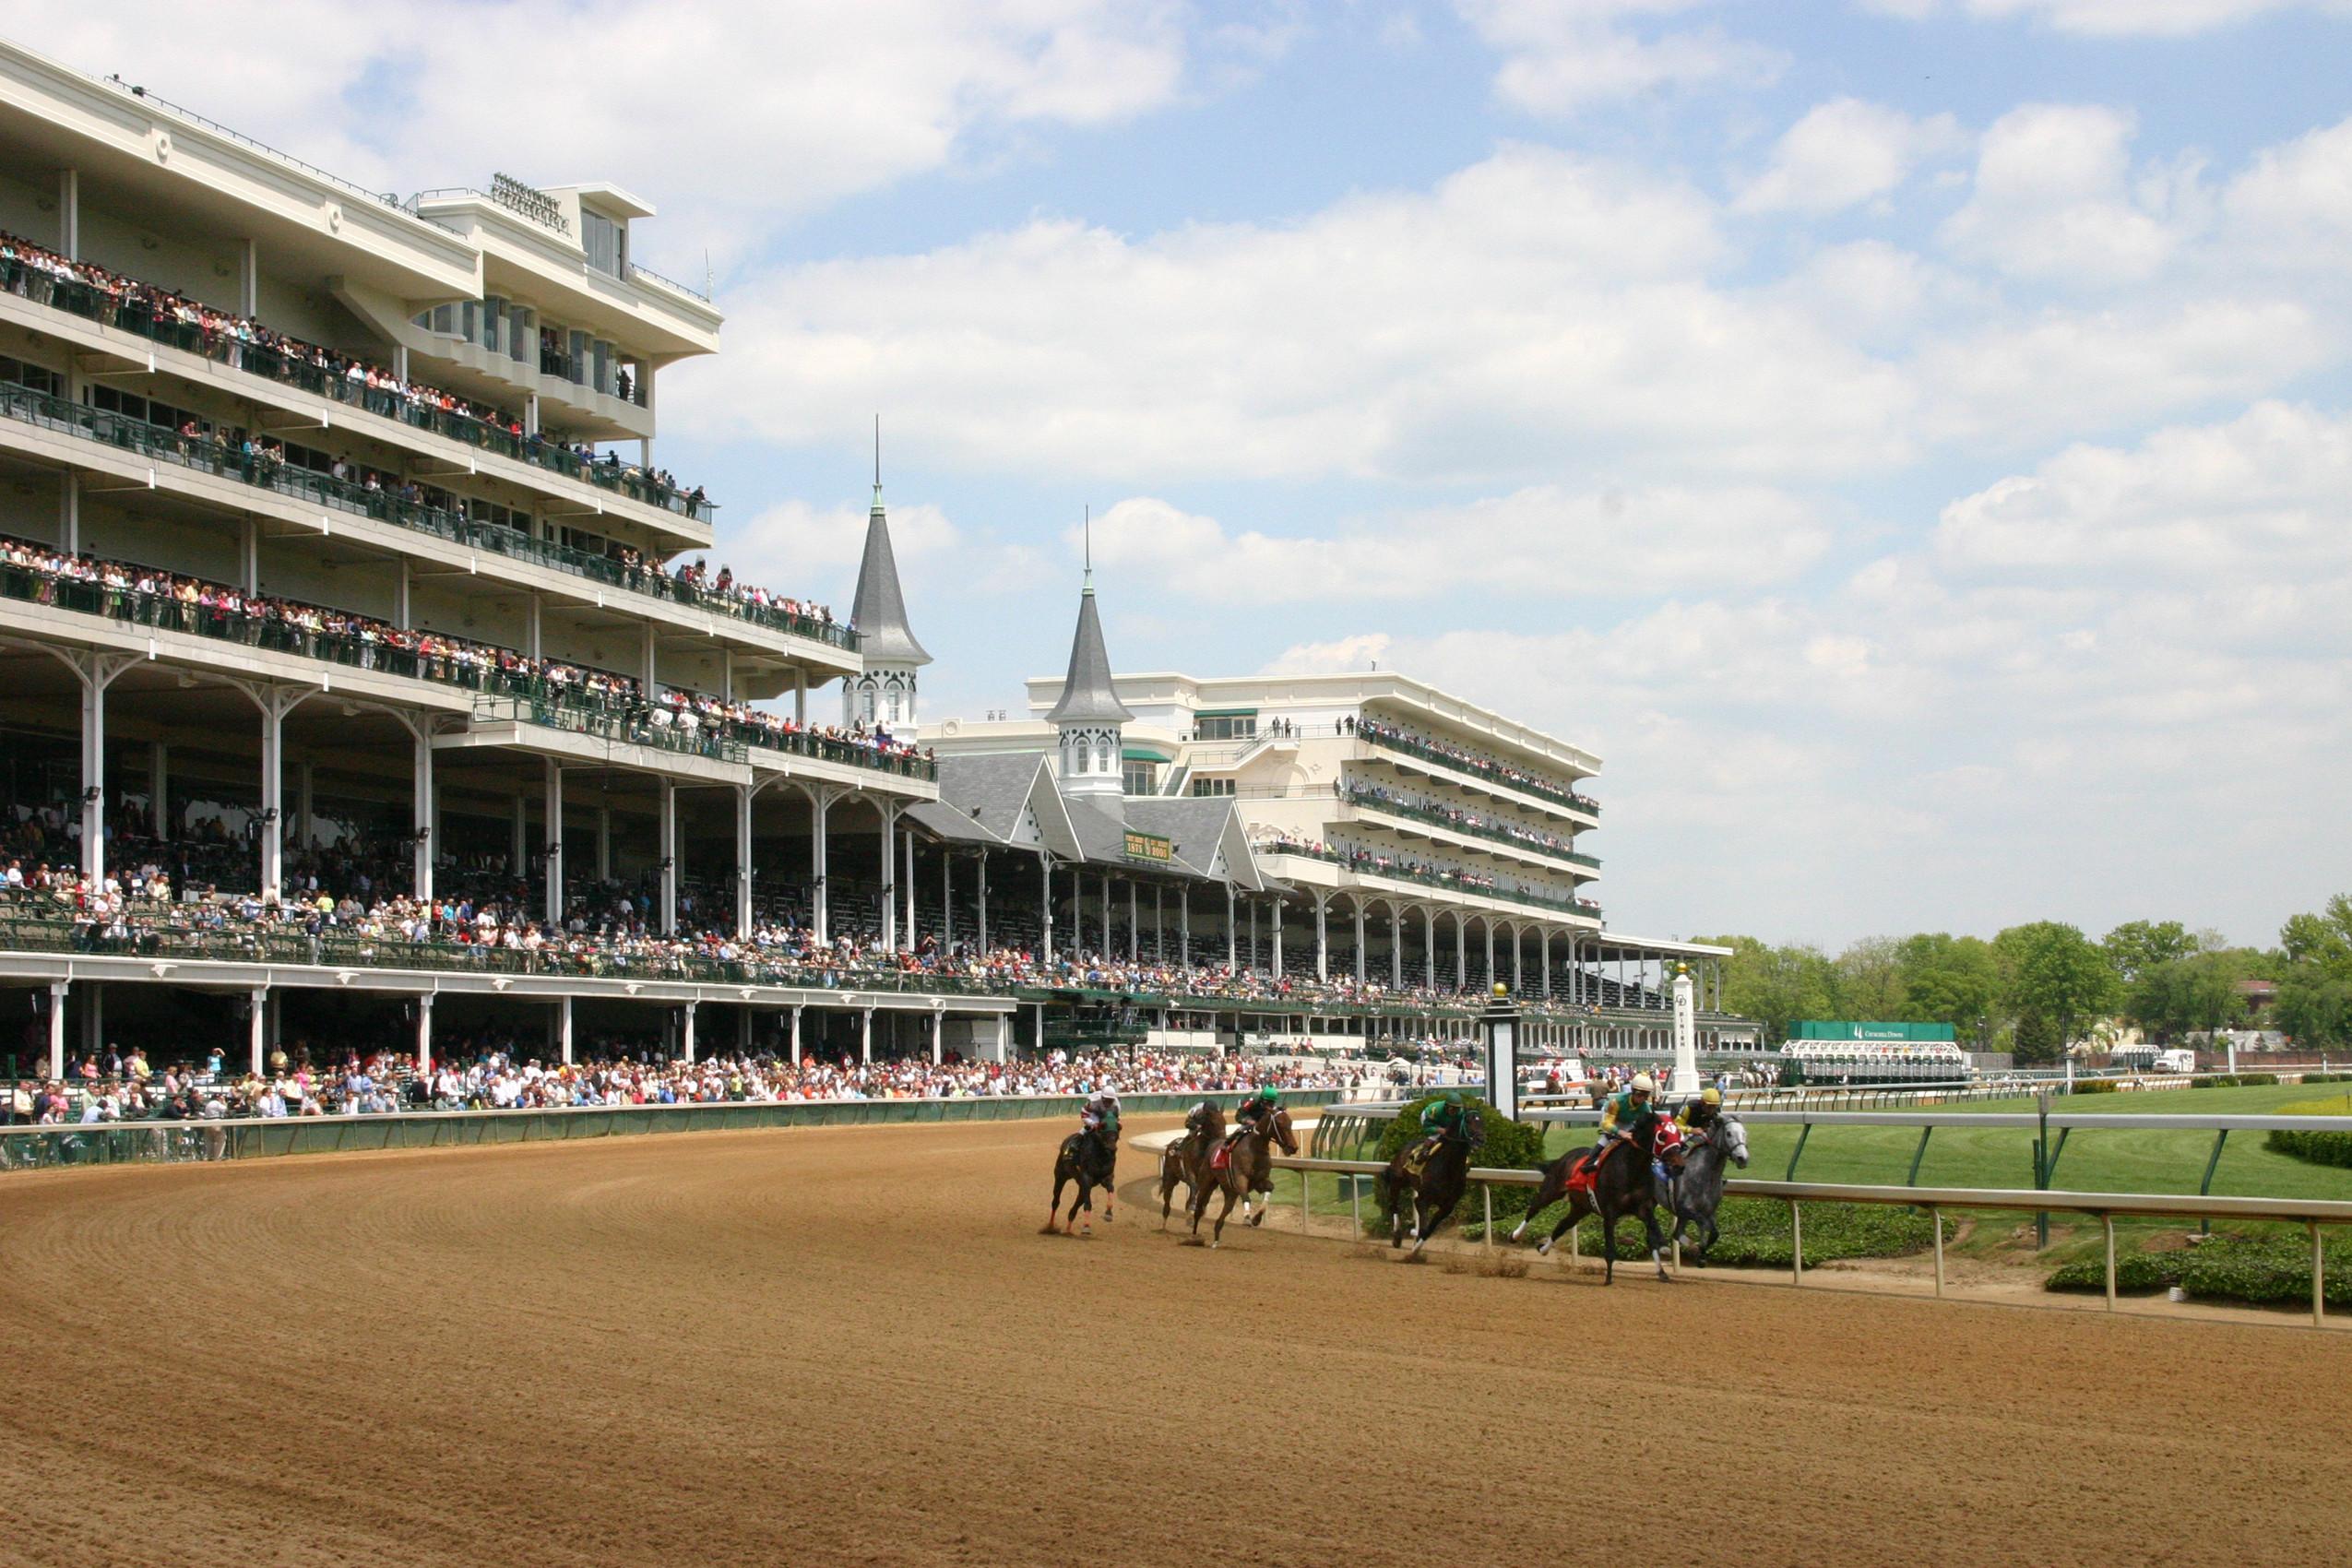 Desktop Wallpaper: Horses, horse racing, and horse farms